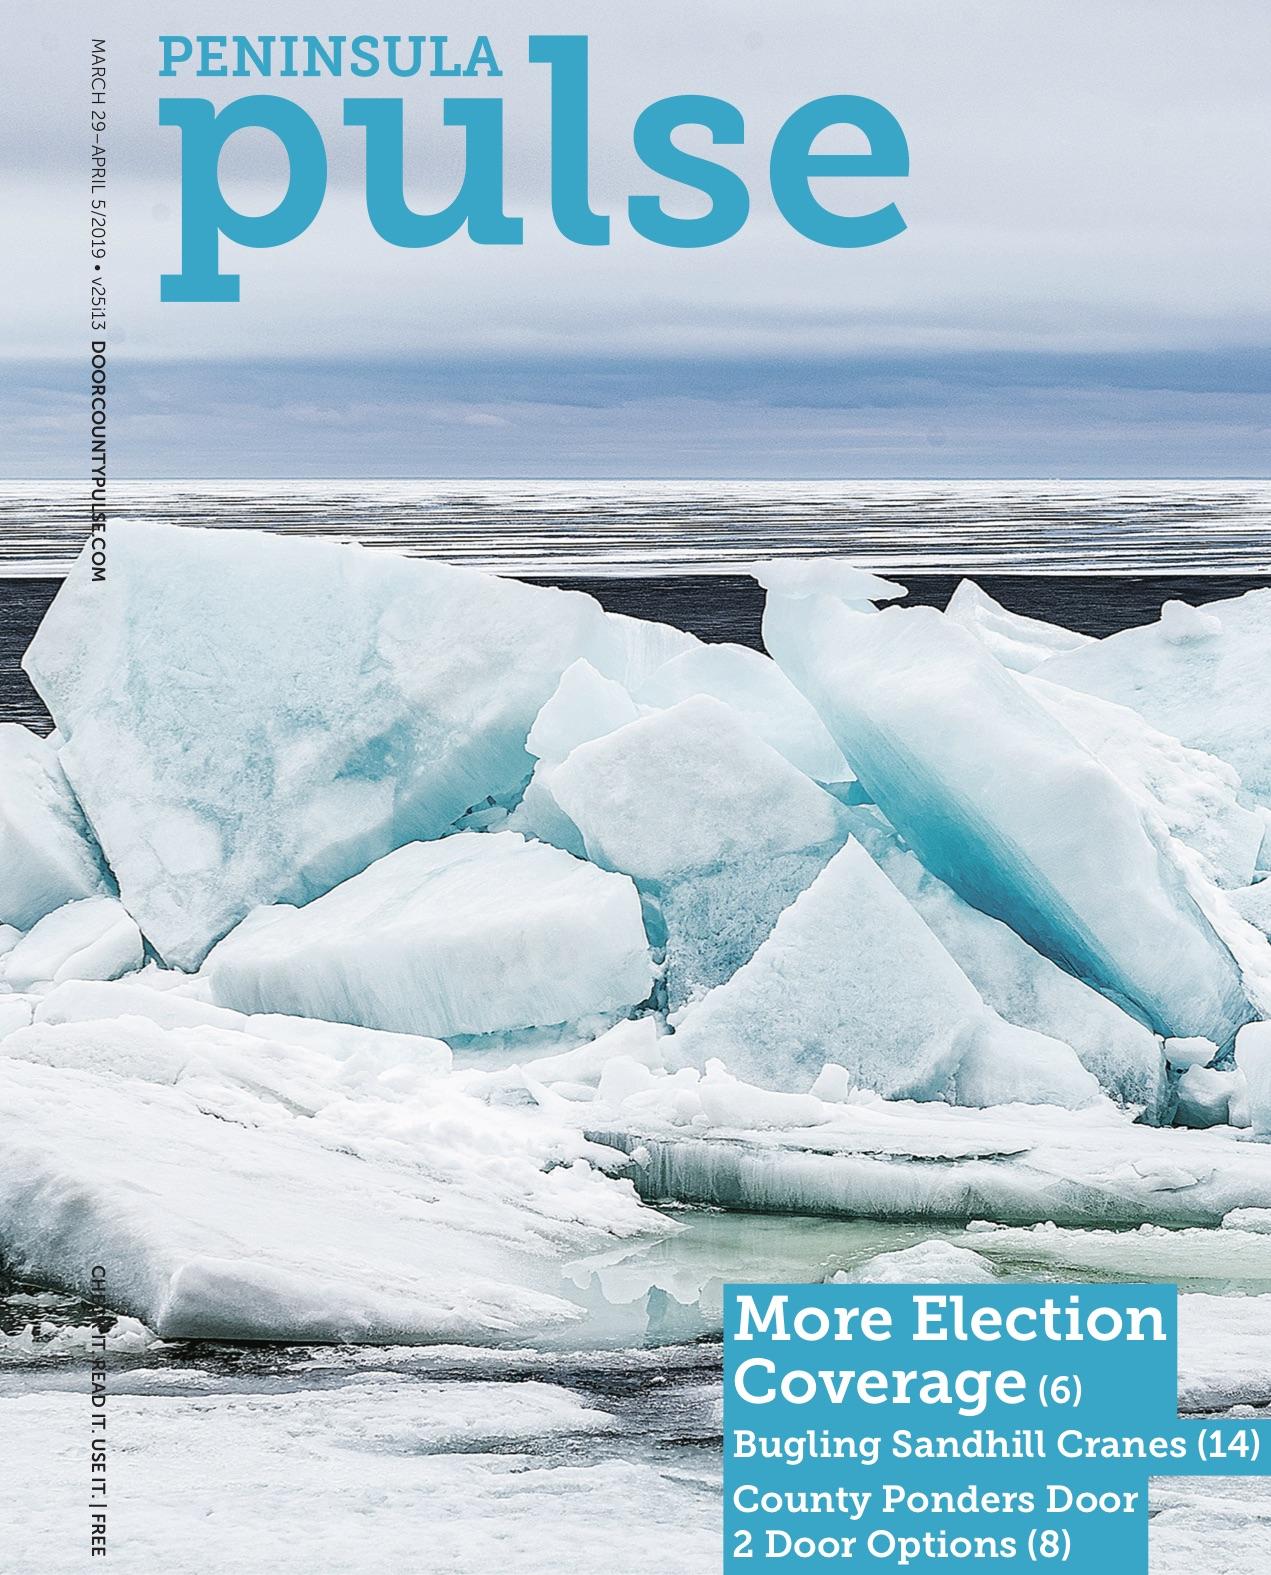 Rit Academic Calendar 2020-21 Peninsula Pulse March 29 April 5, 2019   Door County Pulse